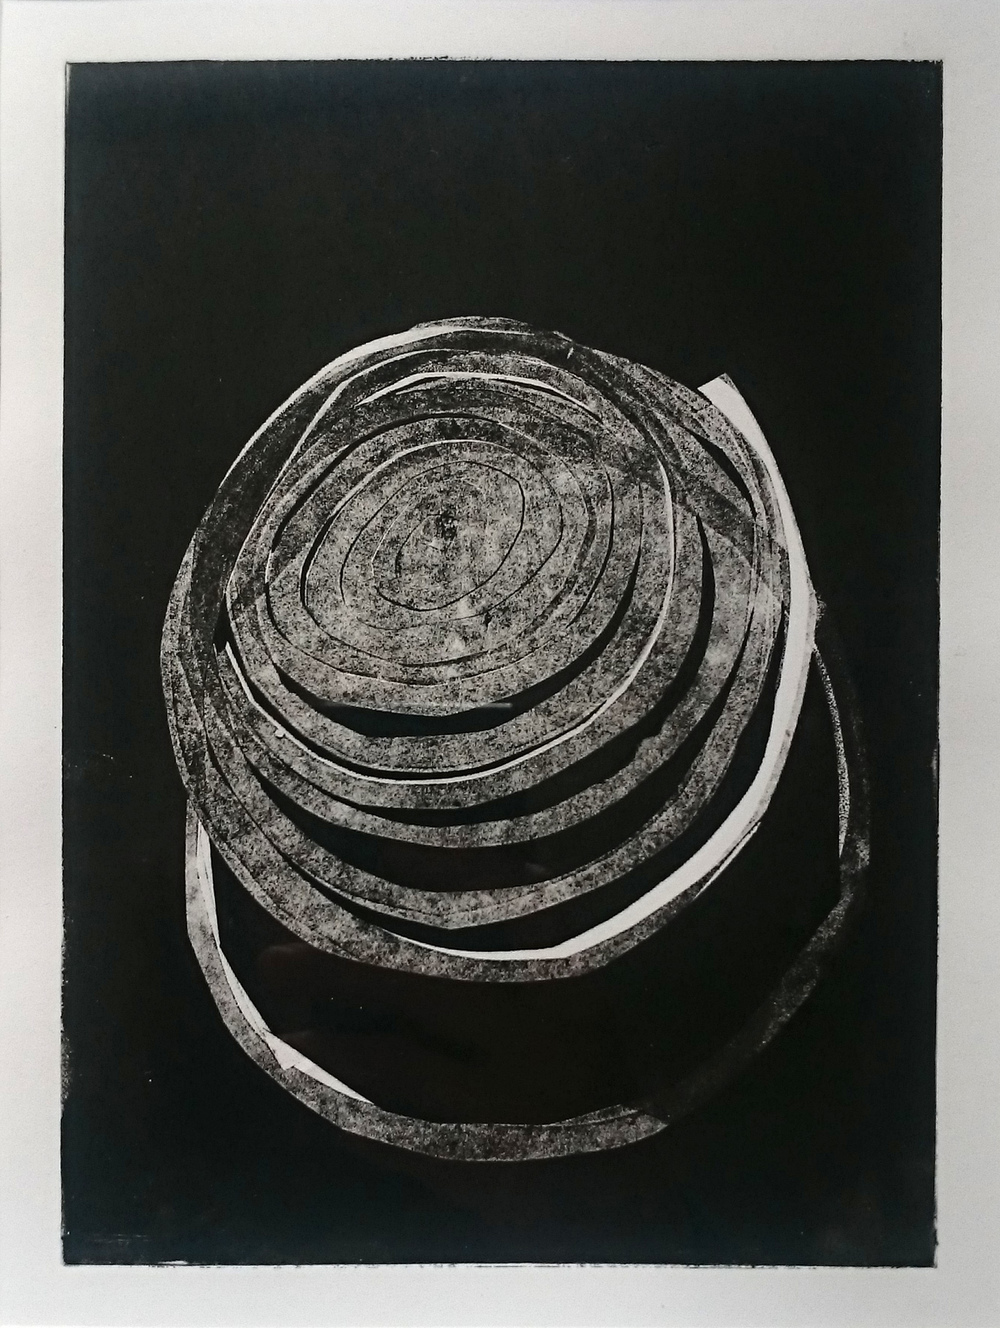 Cutout and monoprint, A4